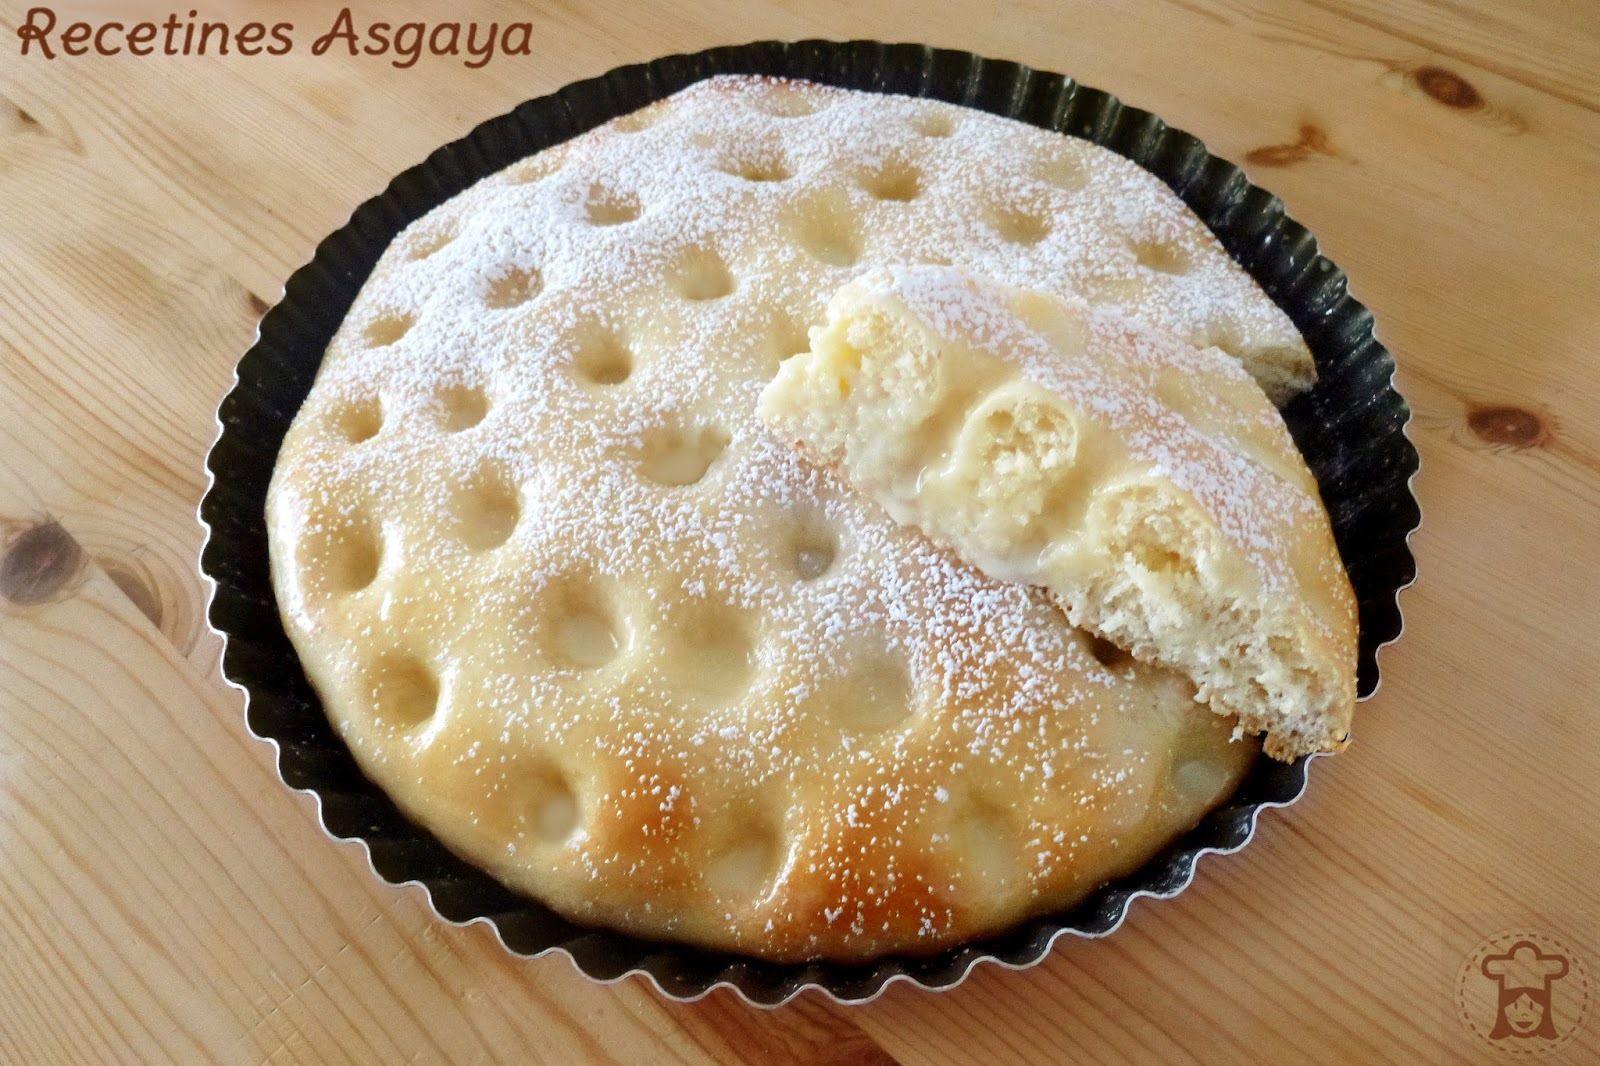 Torta Imperial - http://www.mytaste.es/r/torta-imperial-65033897.html